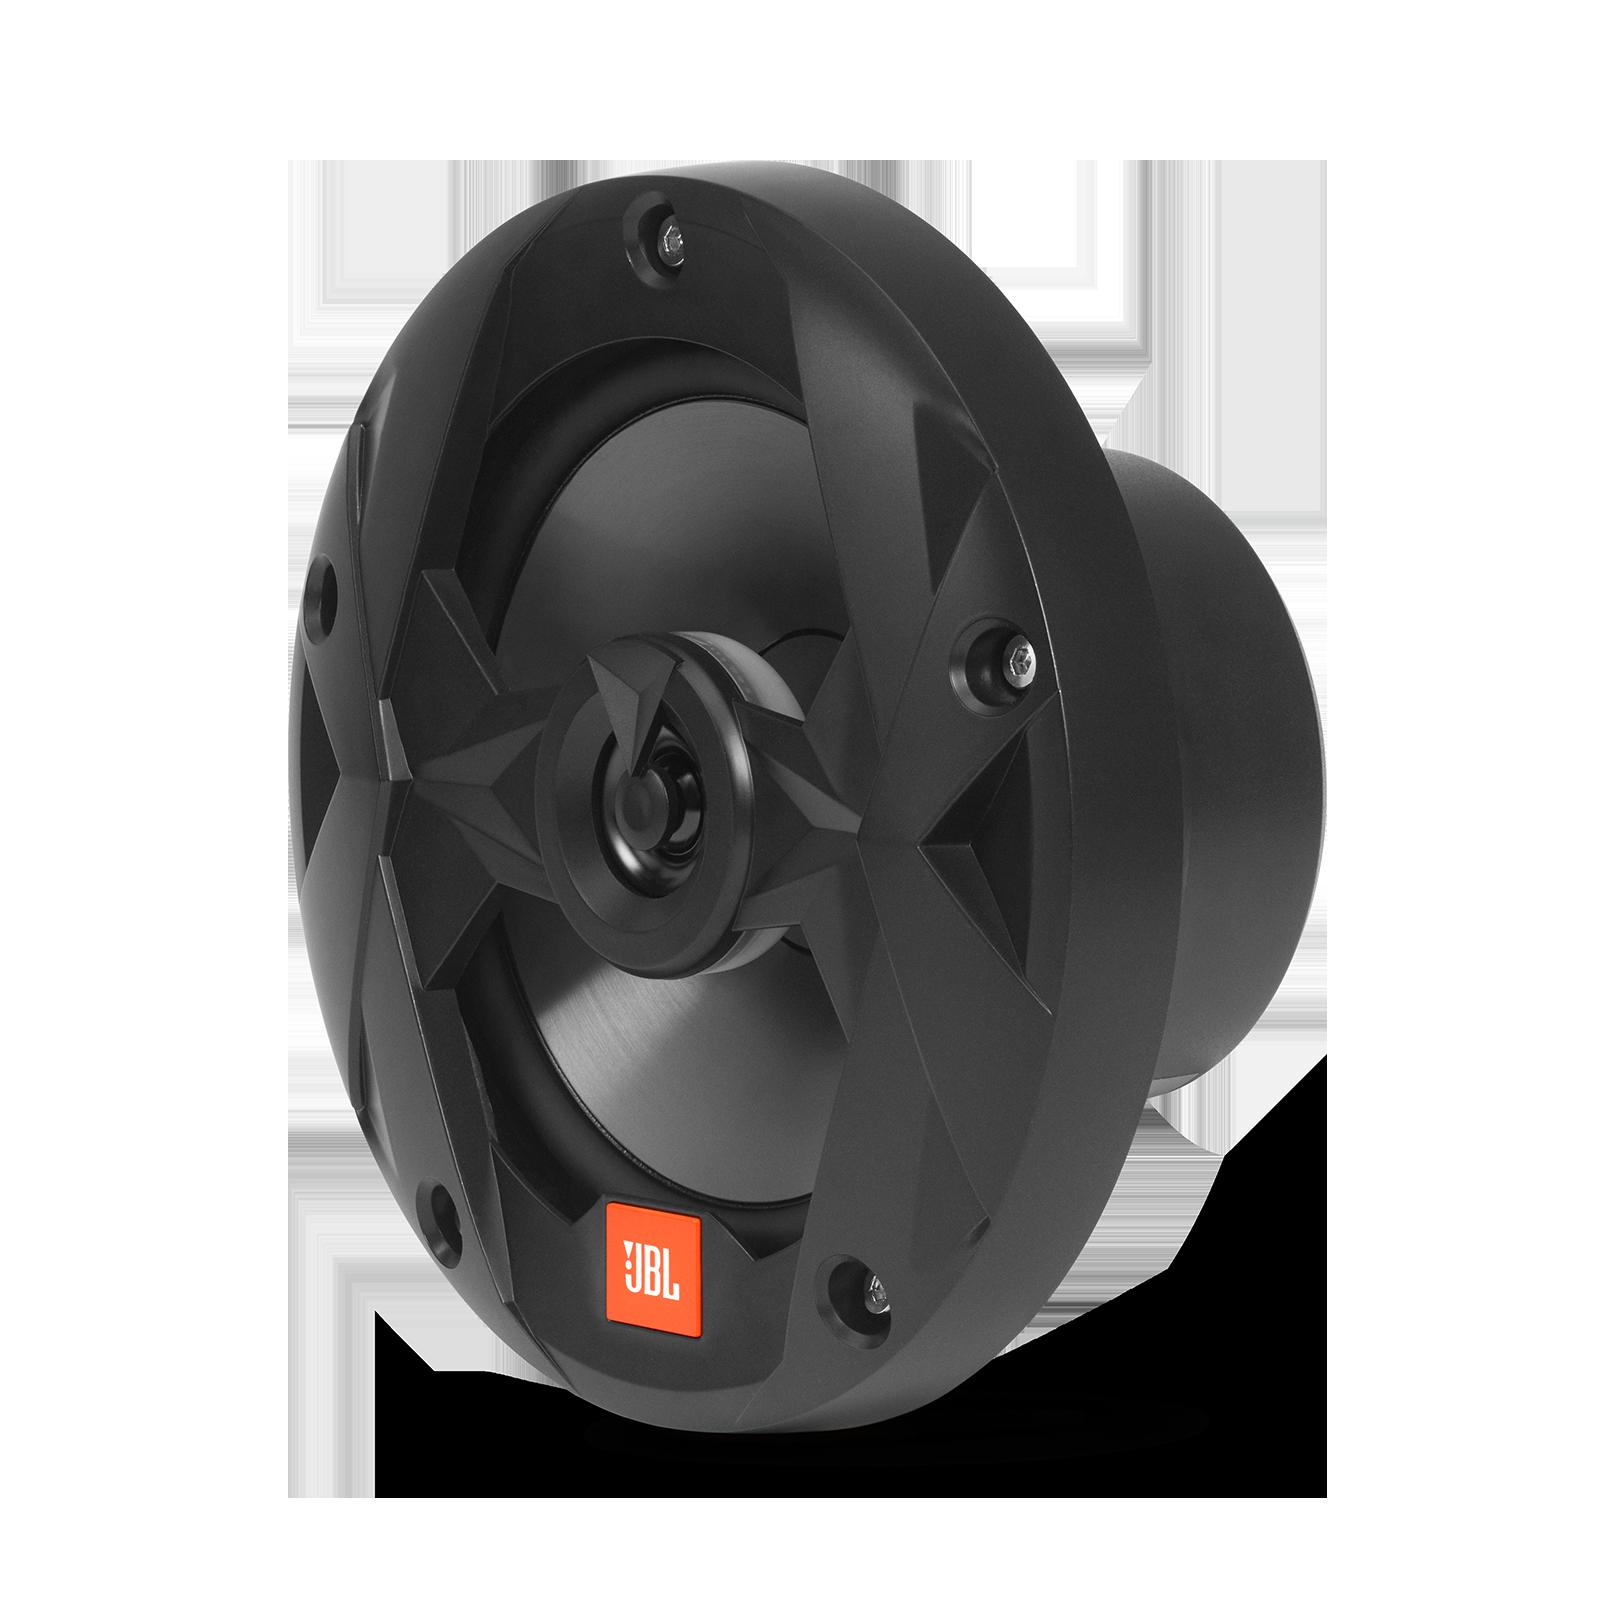 "Club Marine MS65LB - Black Matte - Club Marine MS65LB—6-1/2"" (160mm) two-way marine audio multi-element speaker with RGB lighting – Black - Left"